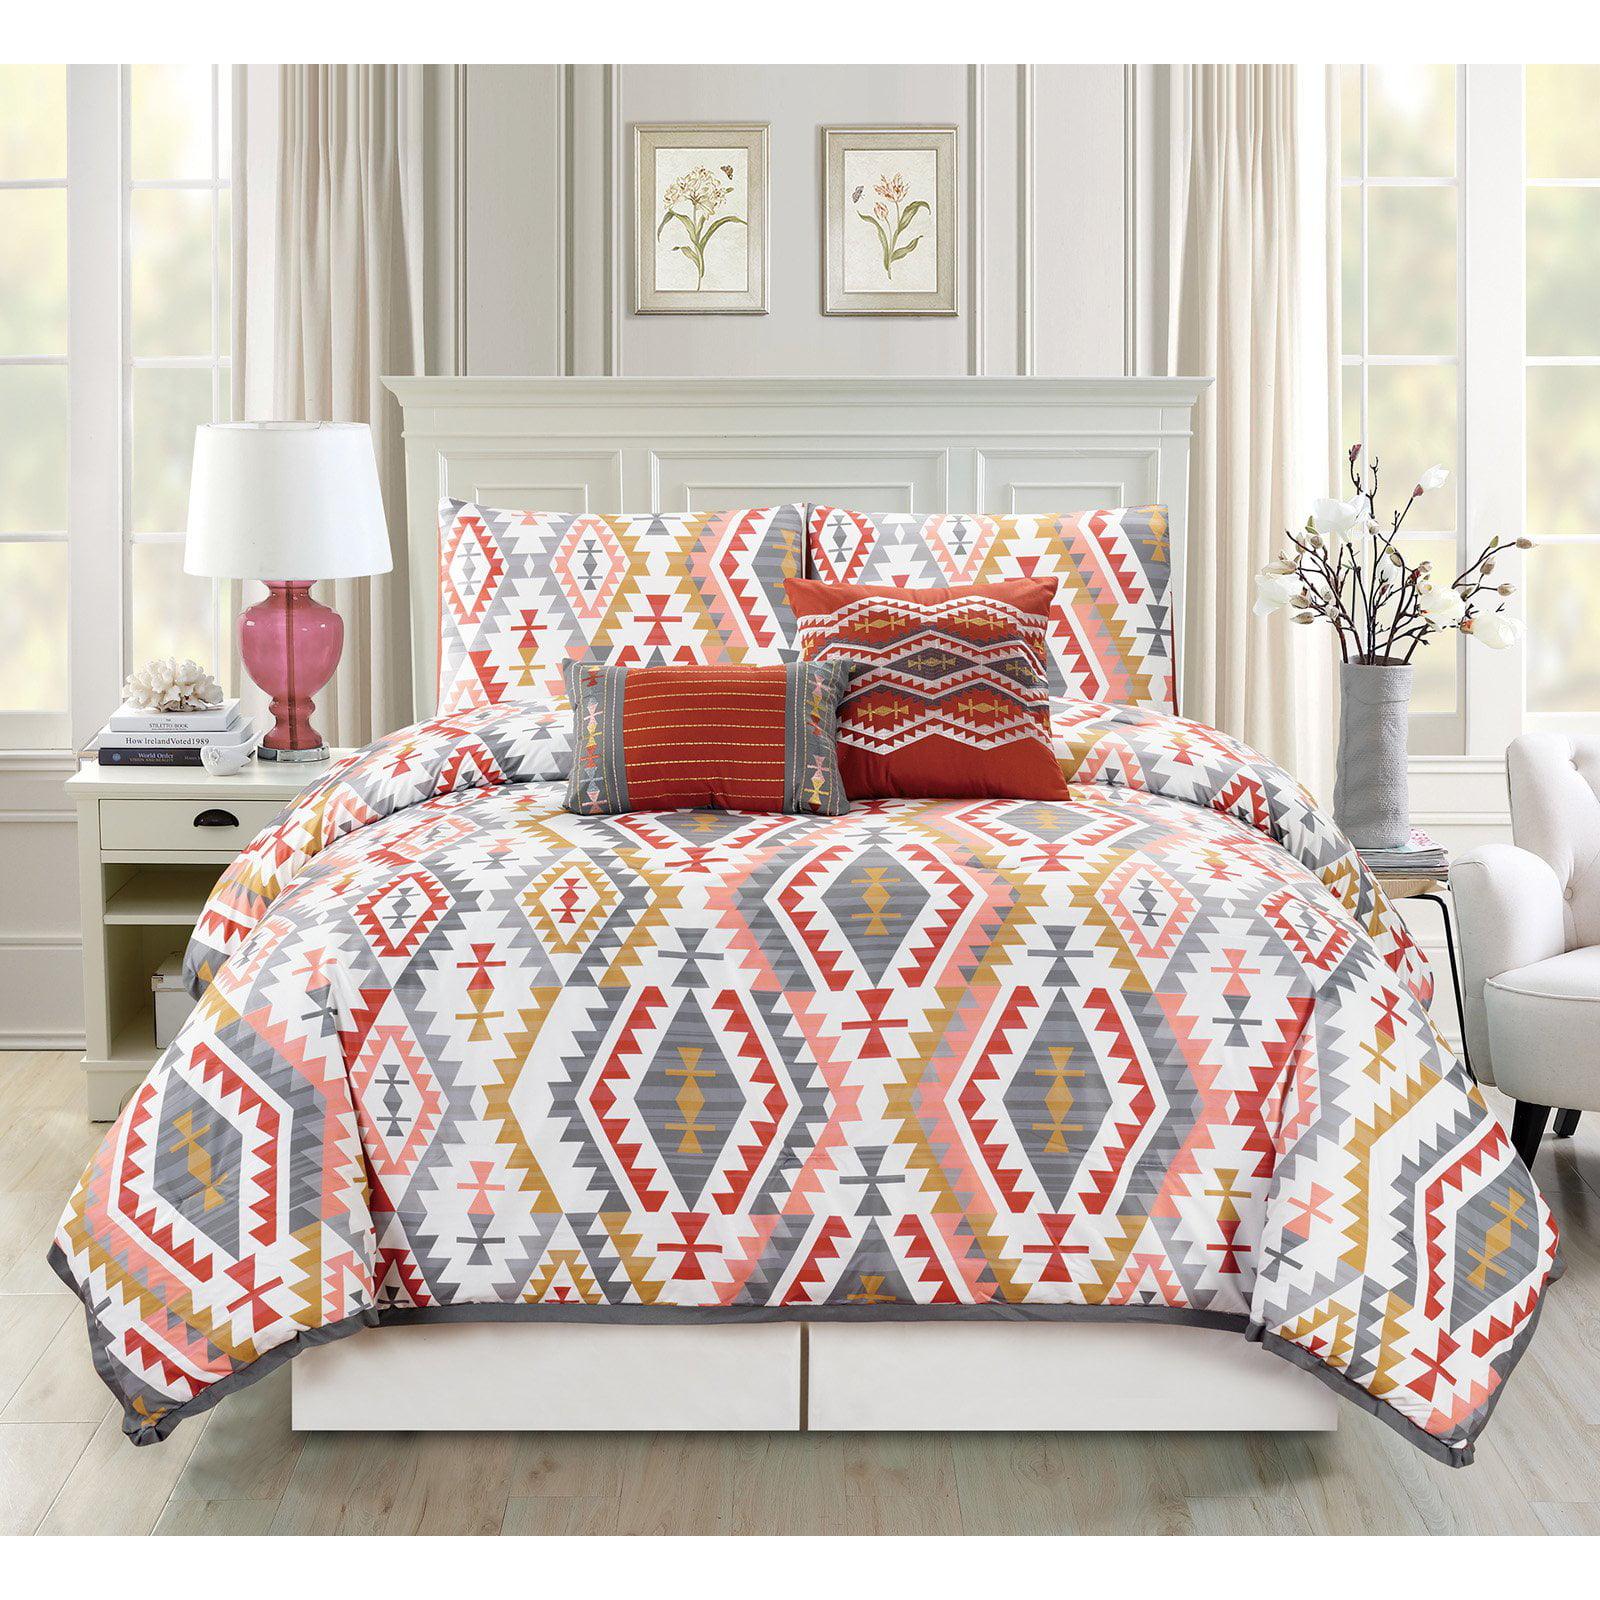 Palazia 5 Piece Comforter Set by Hallmart